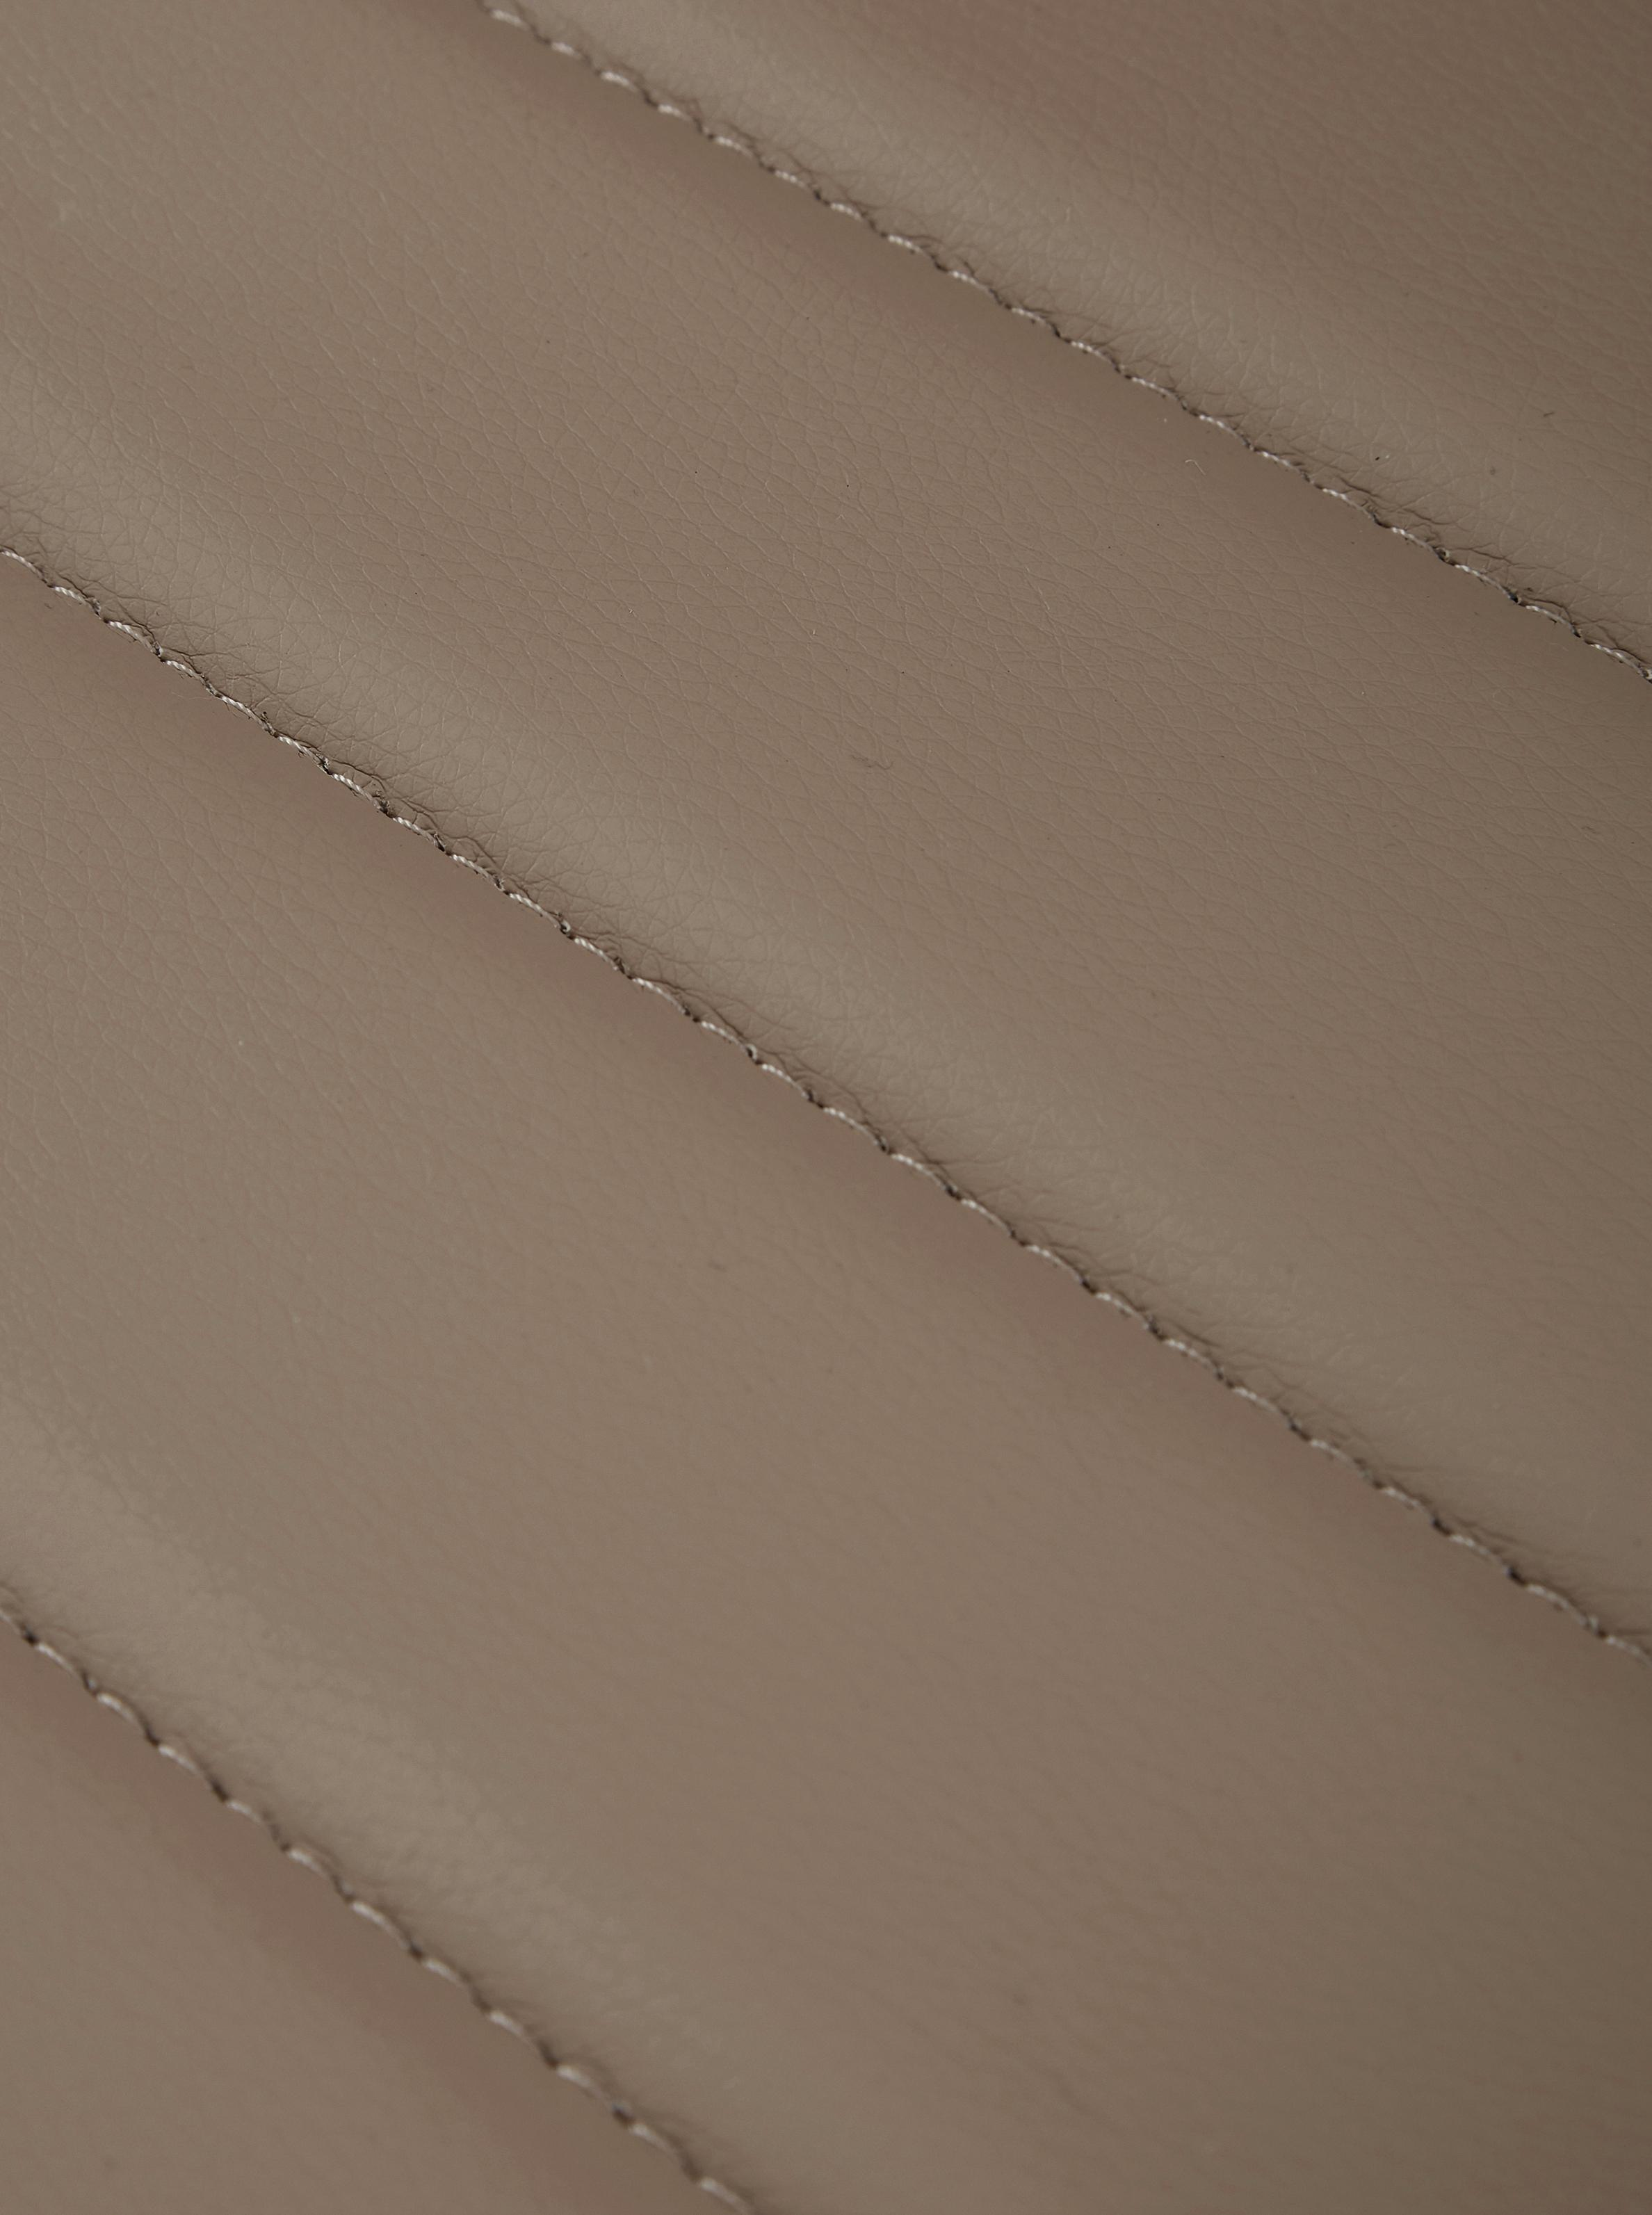 Kunstleder-Chefsessel Praga, höhenverstellbar, Gestell: Metall, verchromt, Bezug: Kunstleder (Polyurethan), Armlehnen: Metall, Polyurethan, Rollen: Nylon, Taupe, 59 x 110 cm